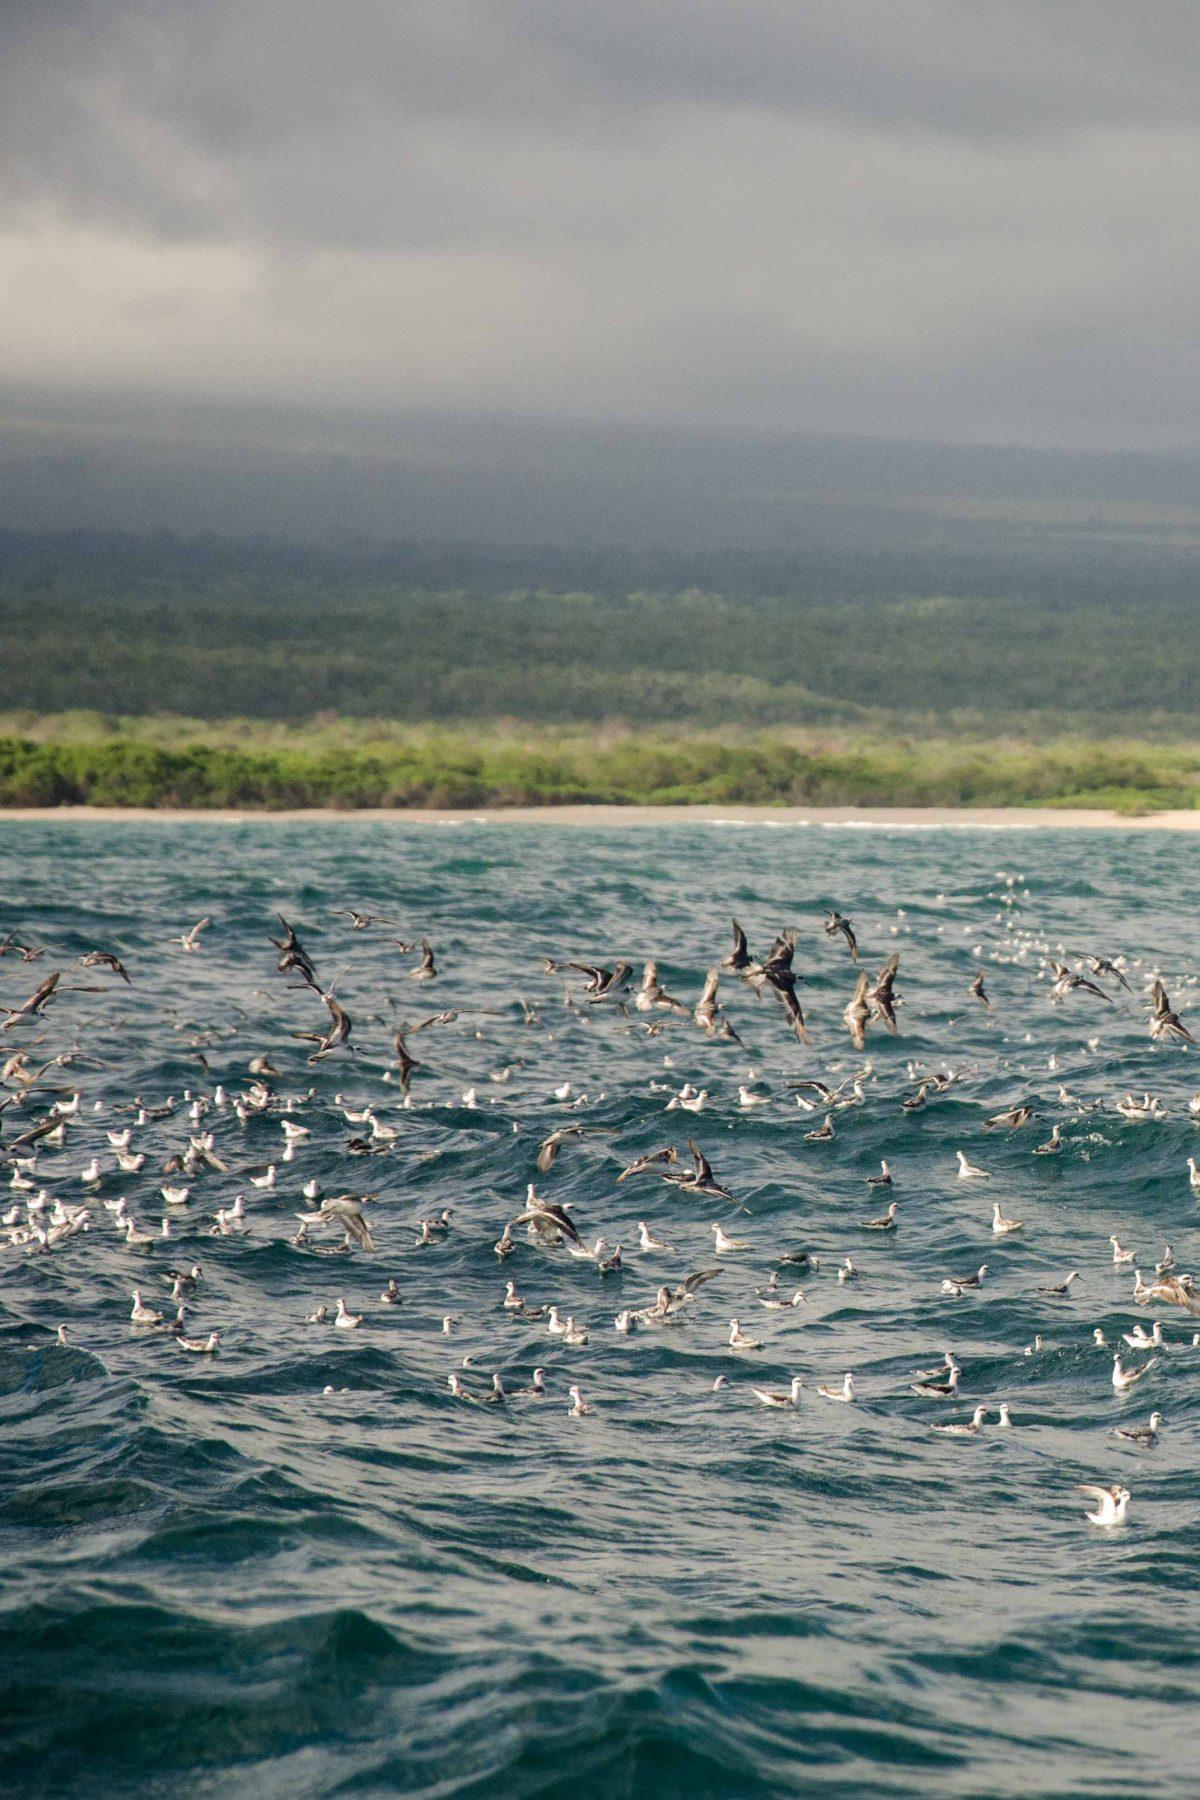 Flock of birds takes flight, Isla Isabela, The Galapagos, Ecuador | ©Angela Drake / Not Your Average American